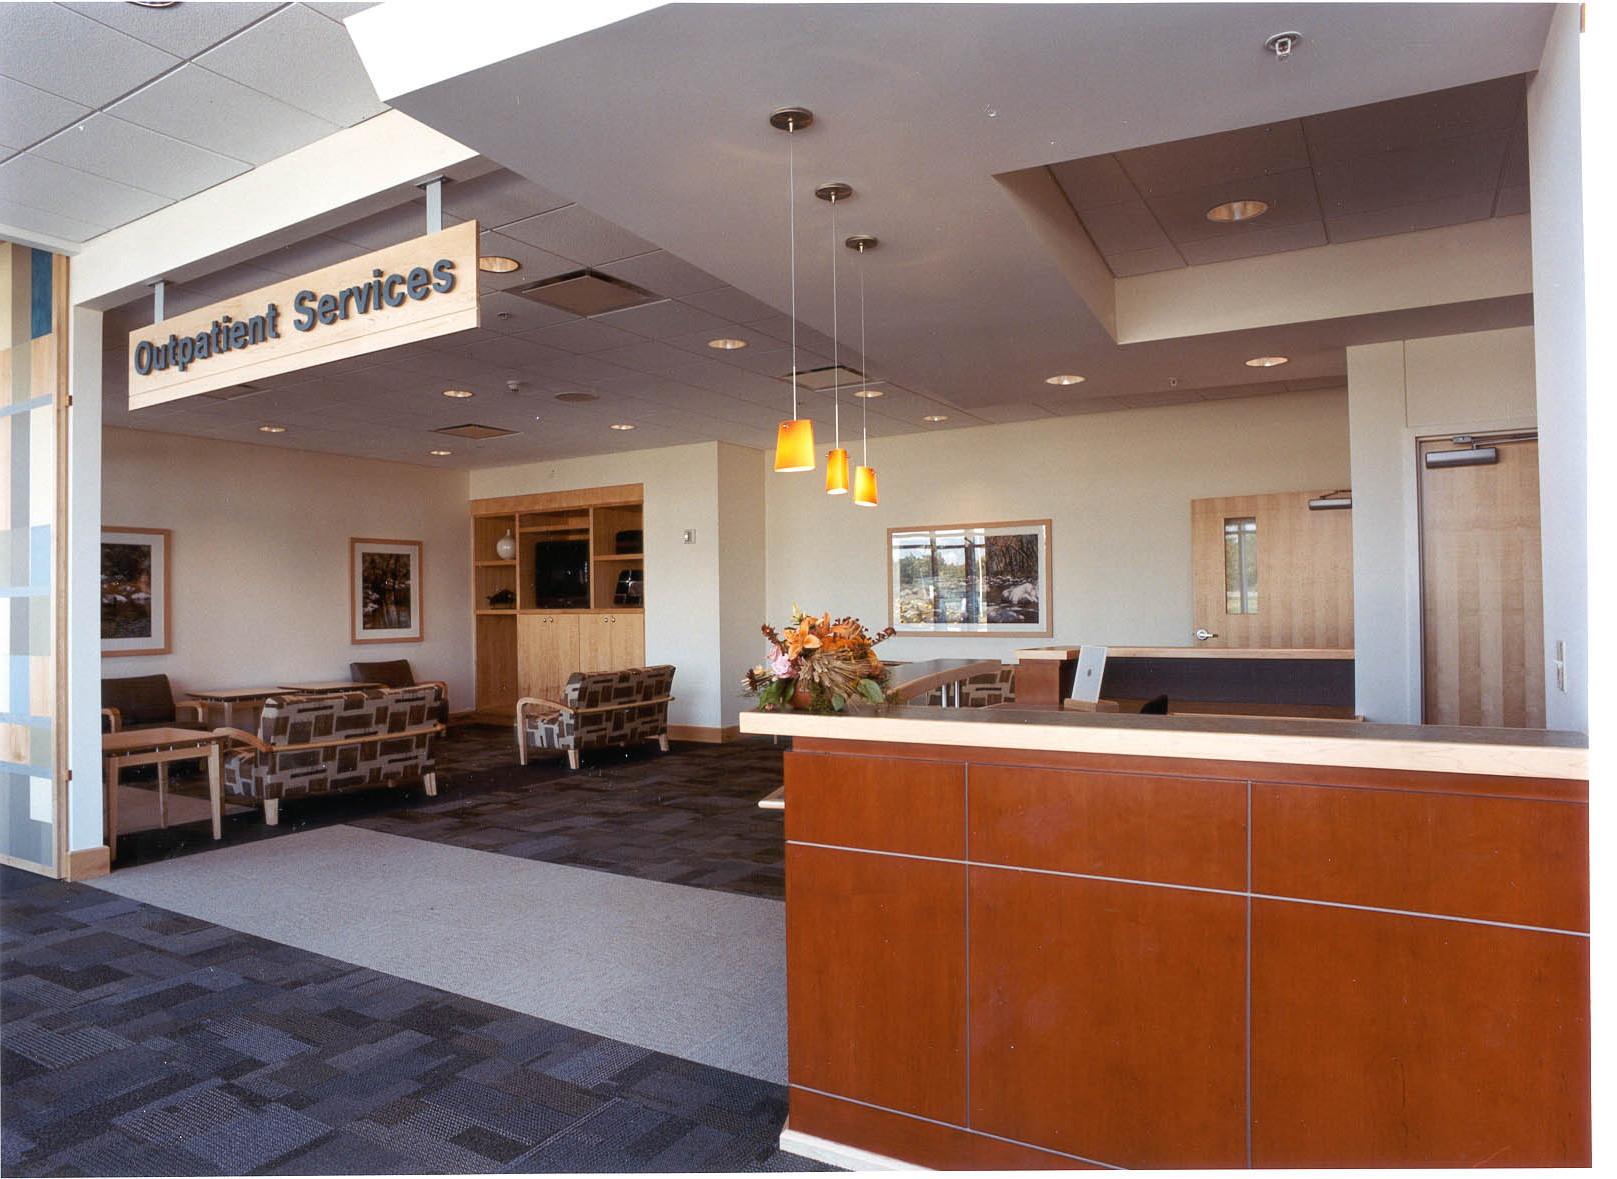 DEFIANCE REGIONAL MEDICAL CENTER